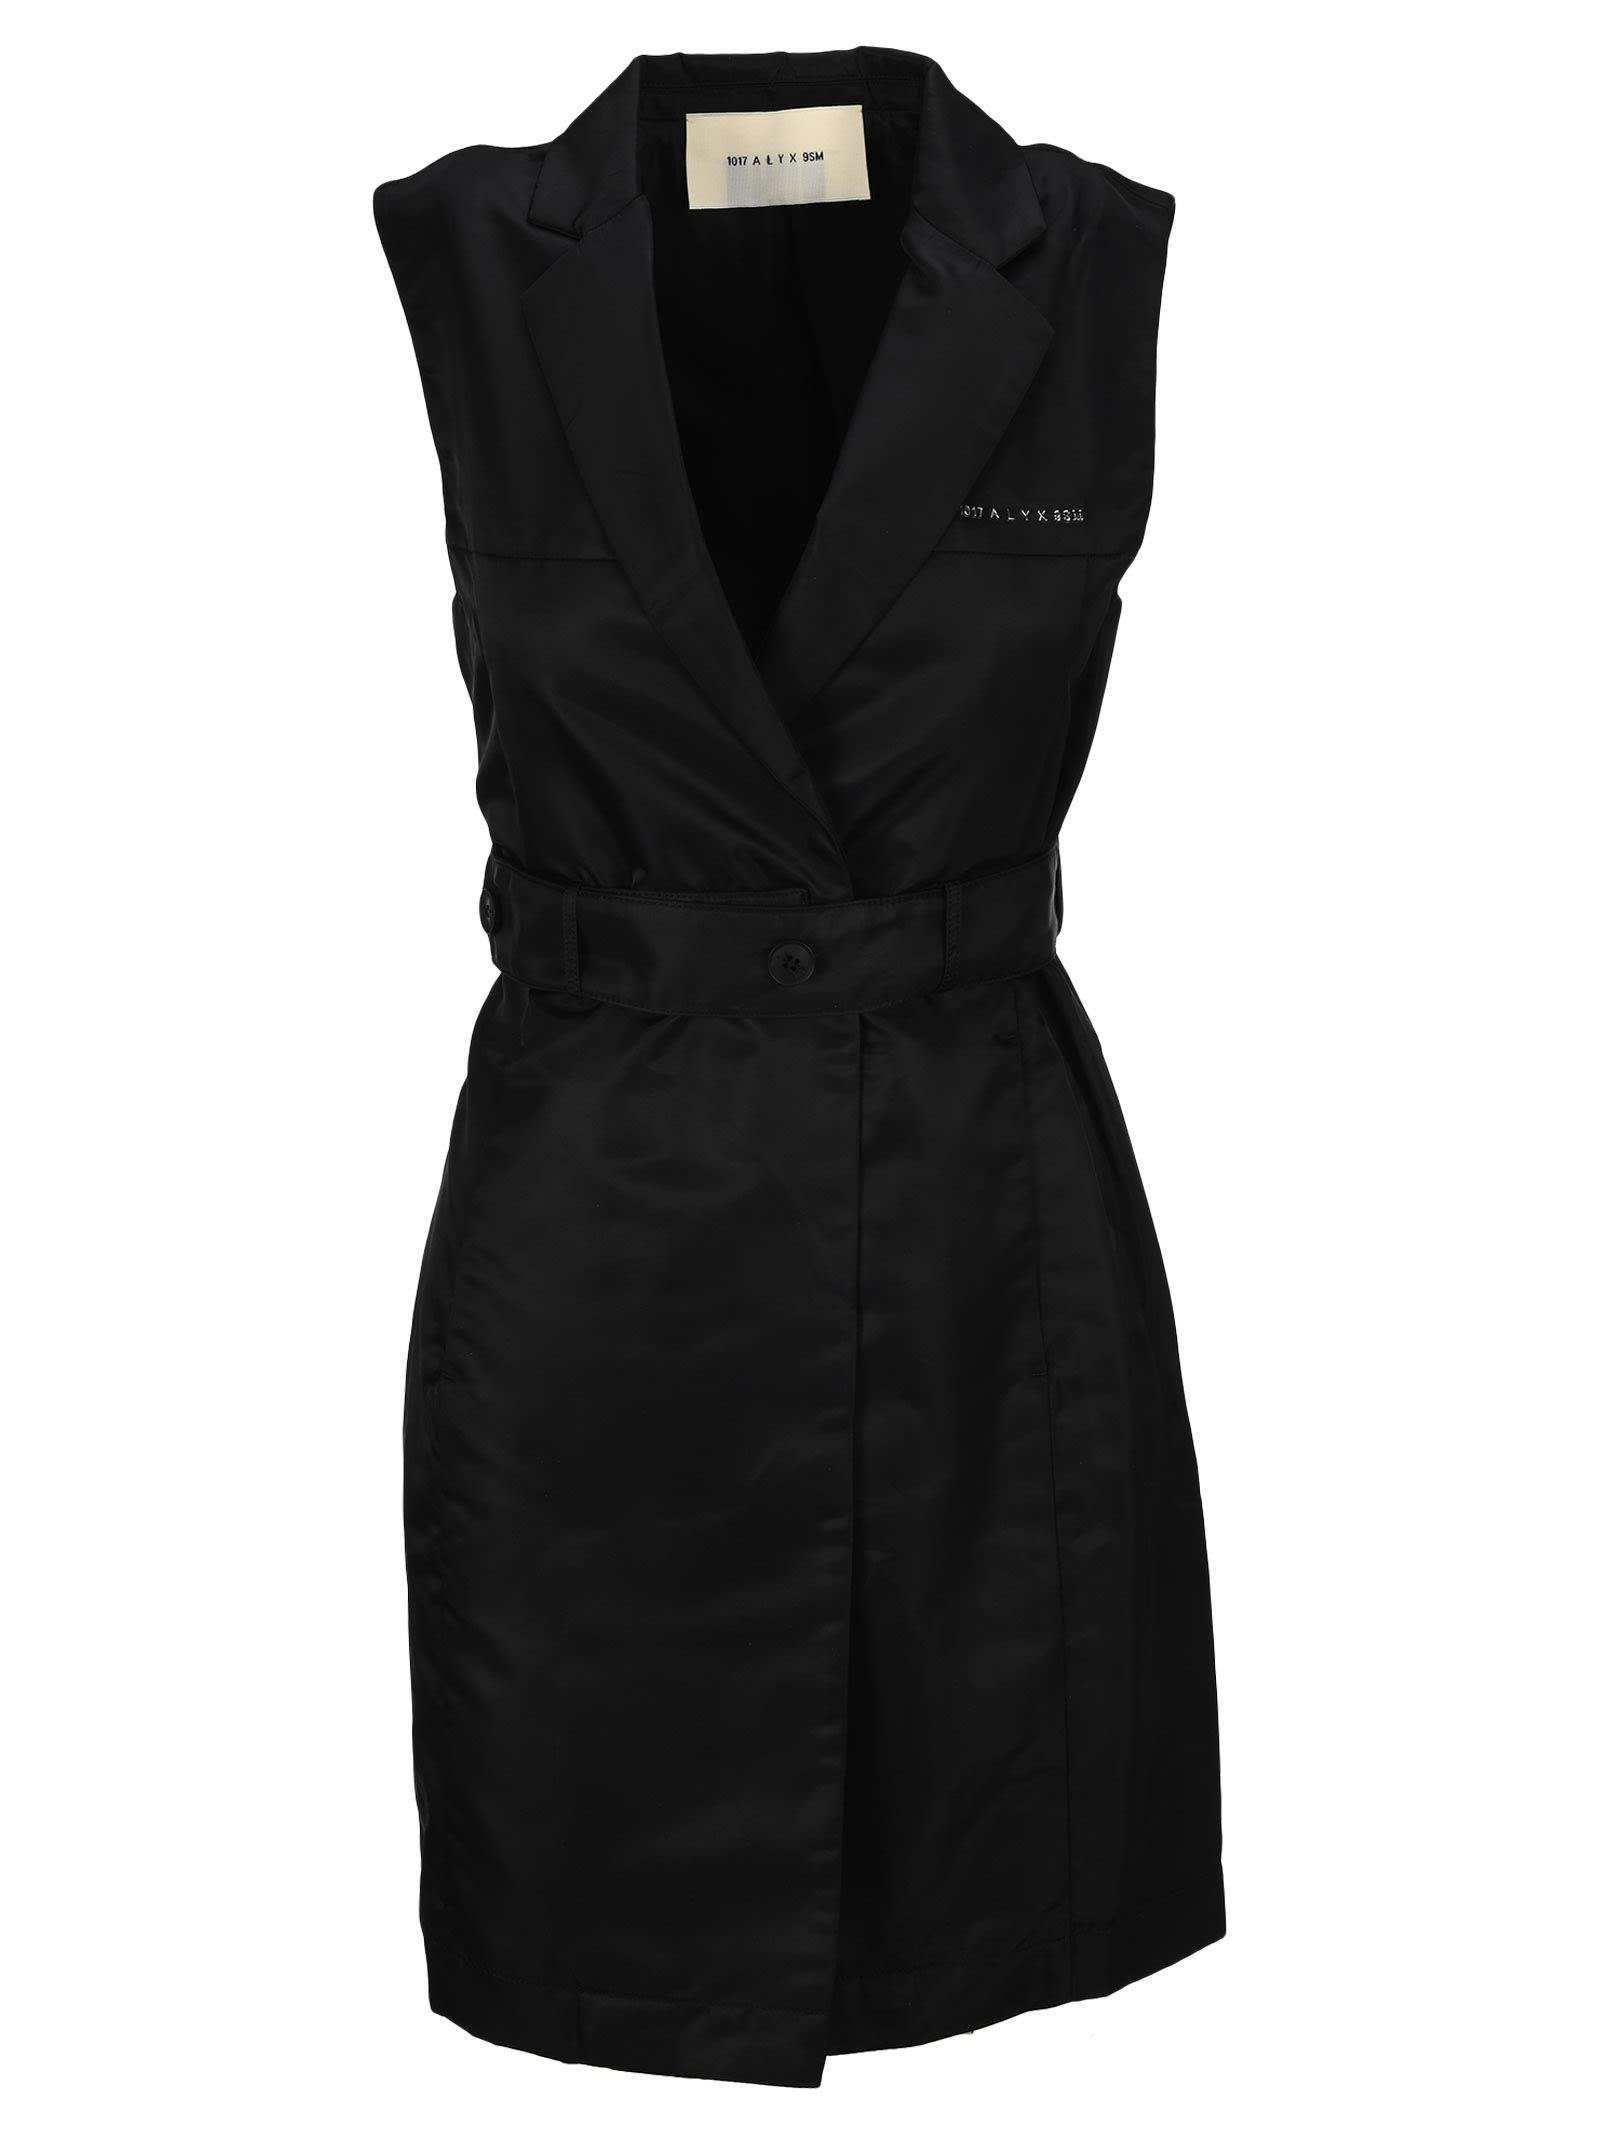 Alyx Tailored Mini Dress In Black